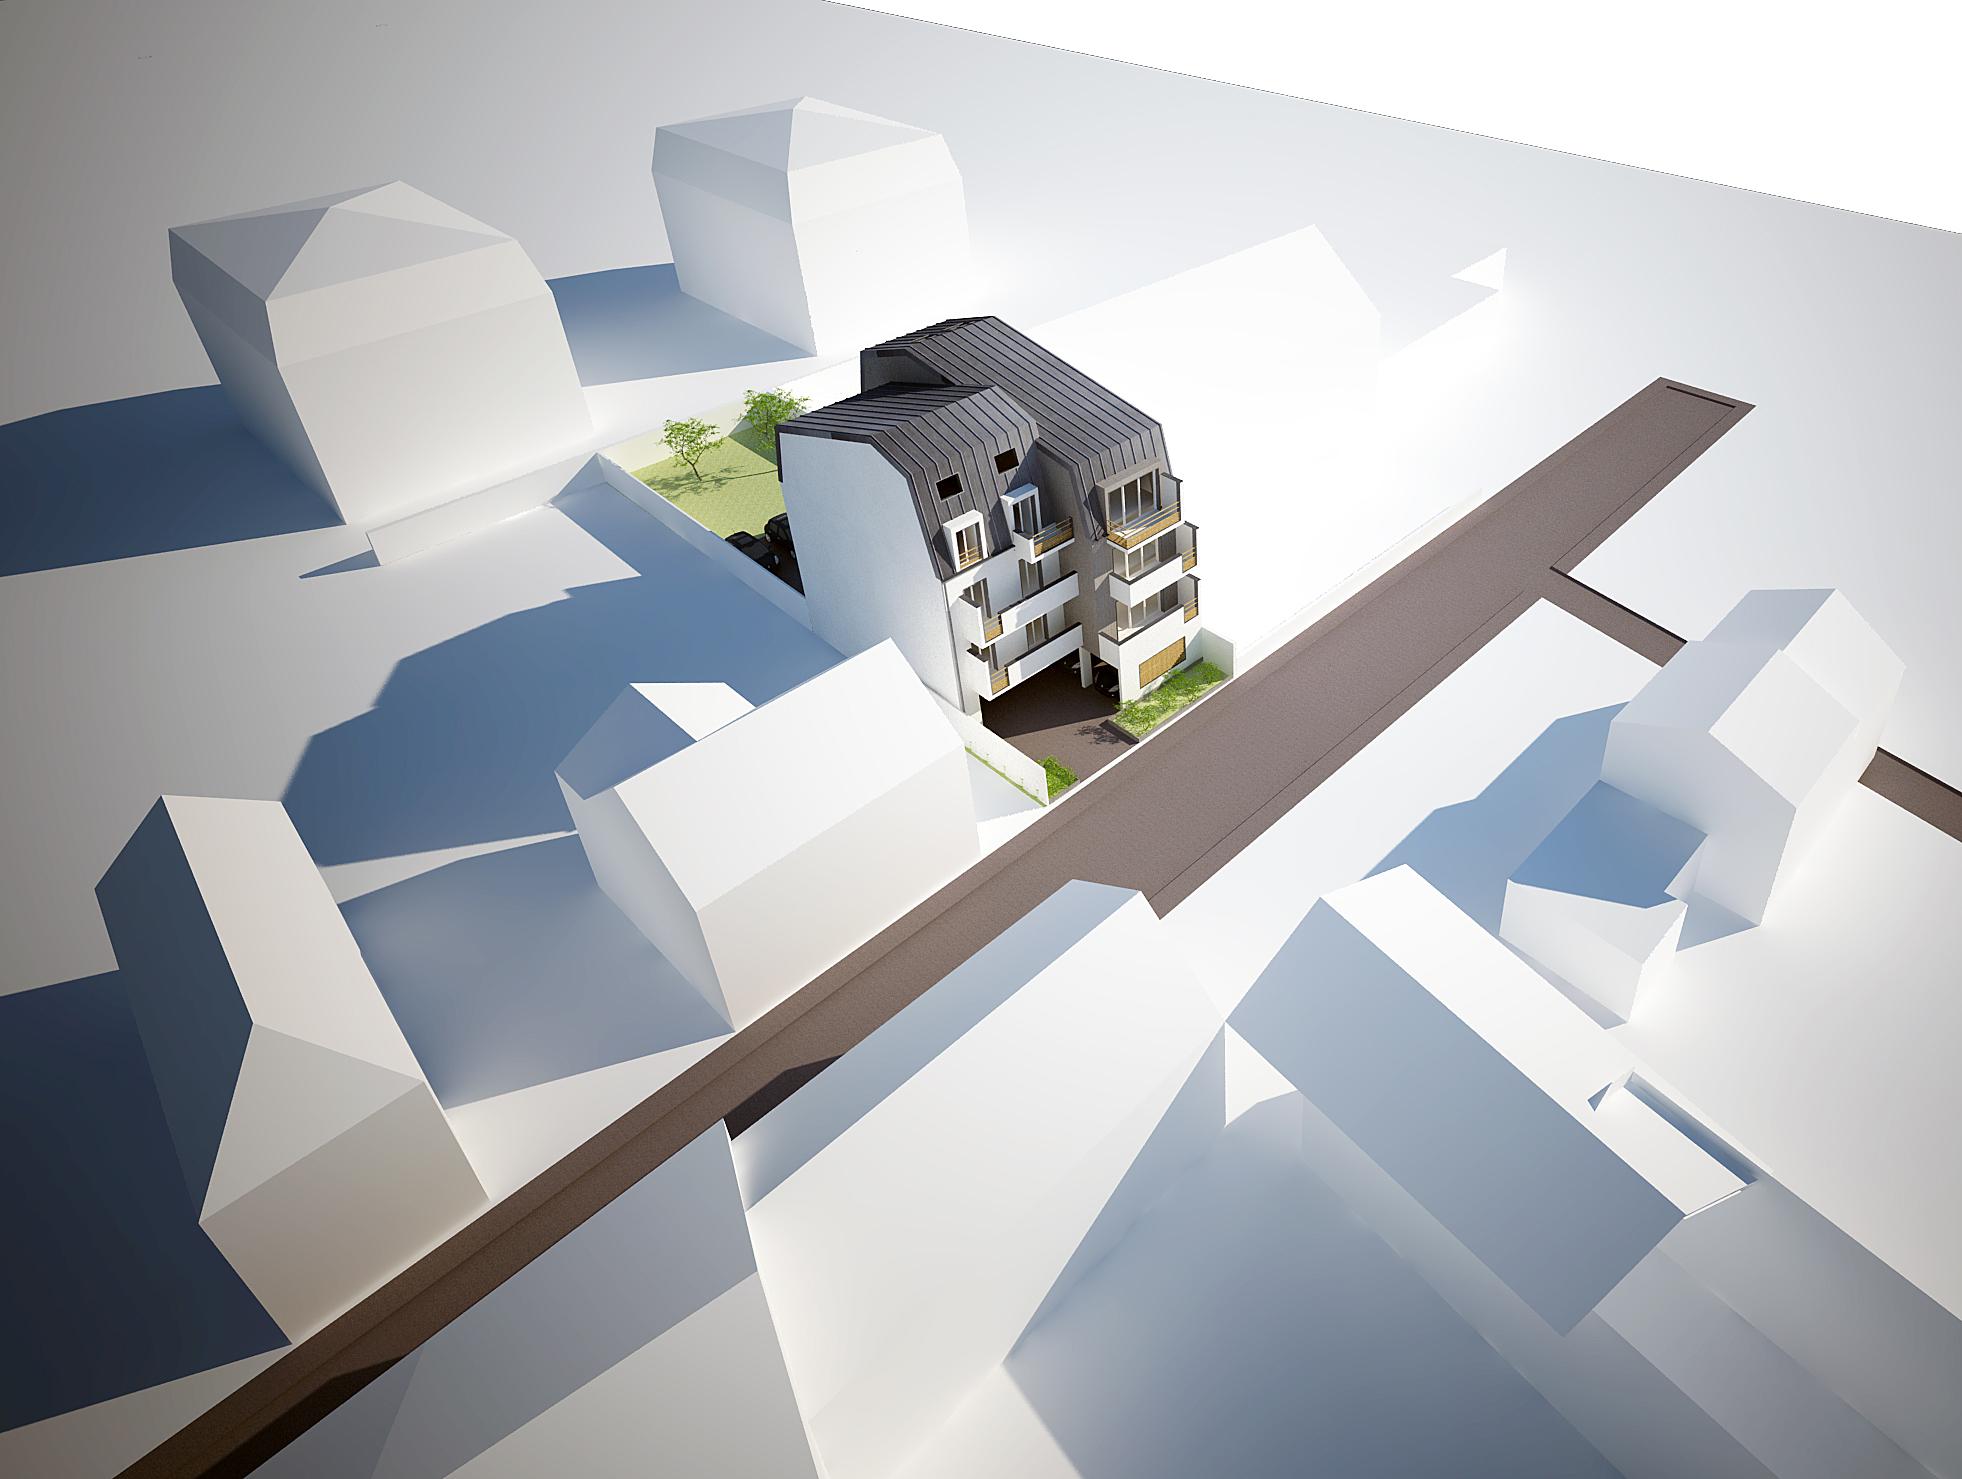 olivier-stadler-architecte-collectif-longjumeau (6)